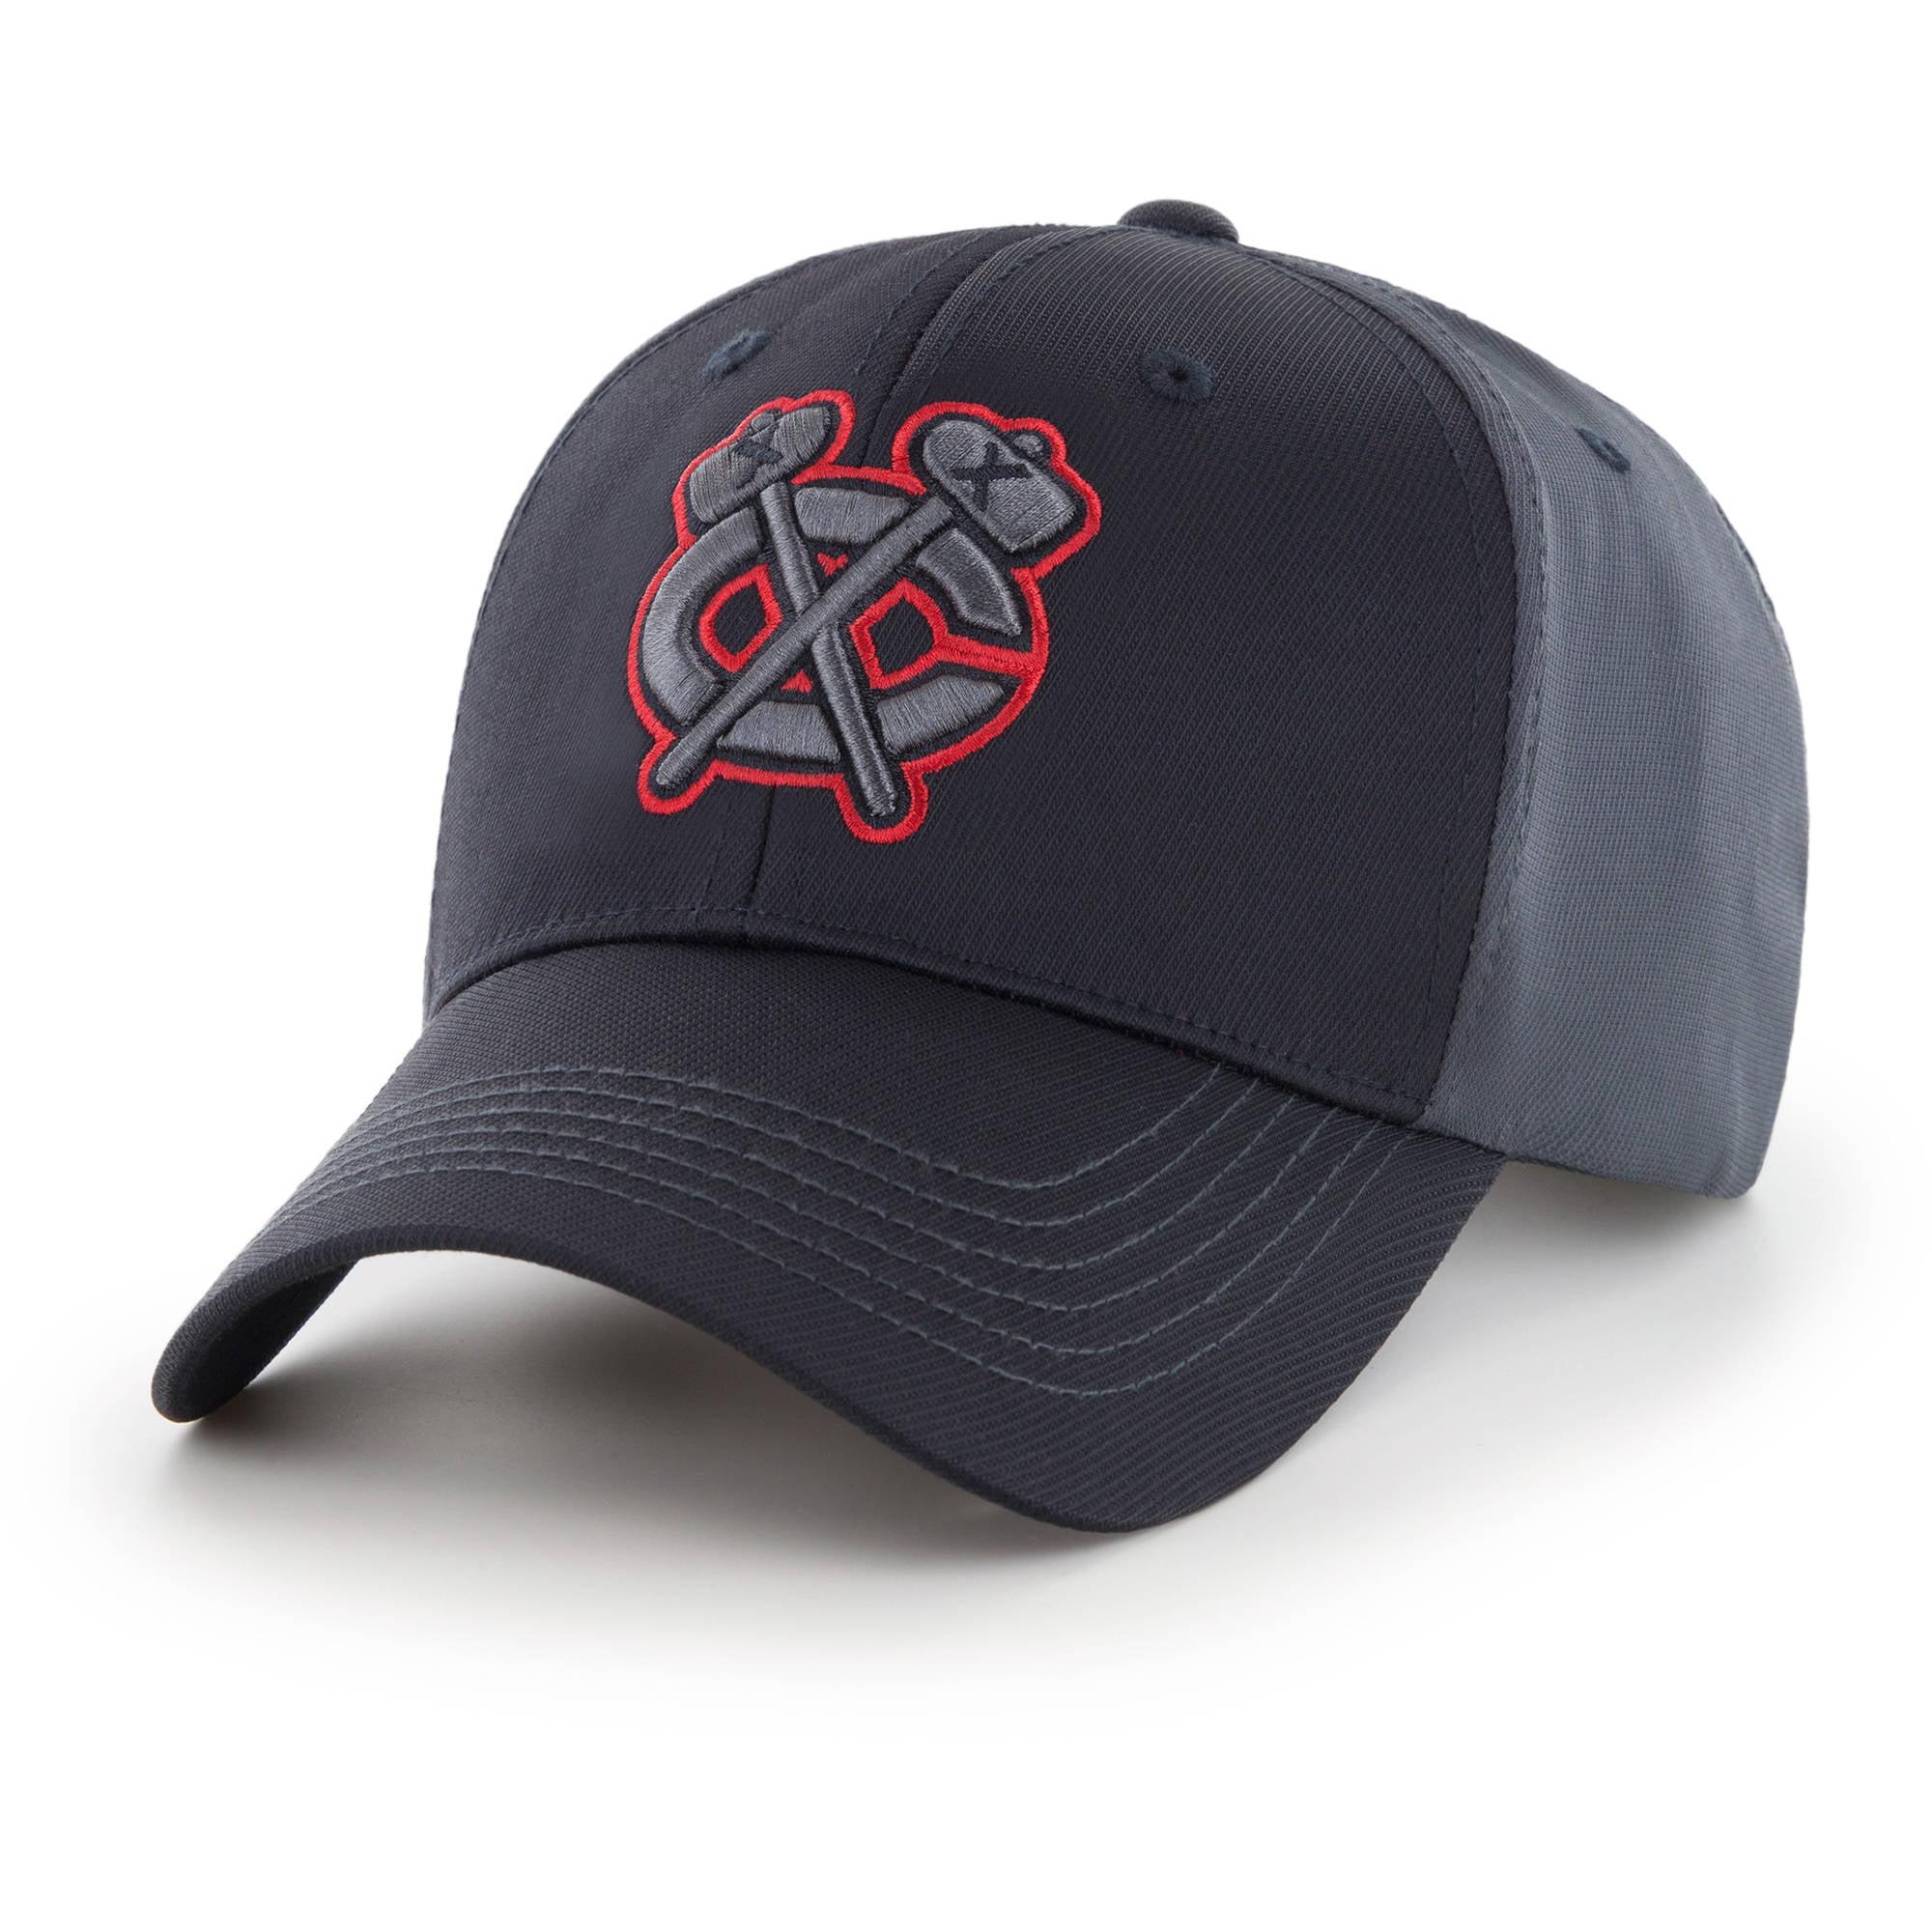 NHL Chicago Blackhawks Mass Blackball Cap